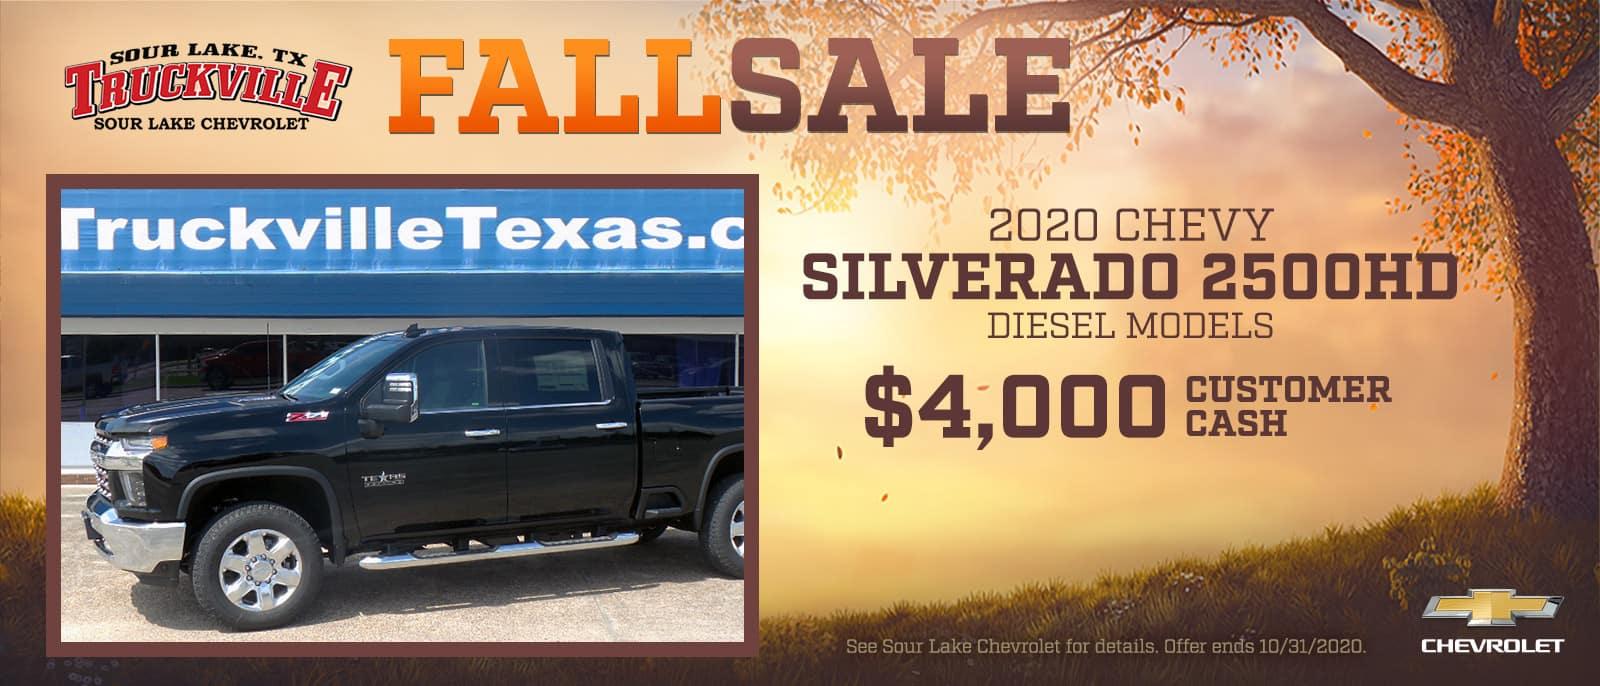 2020 Chevrolet Silverado 2500HD Fall Sale Event | Sour Lake, TX